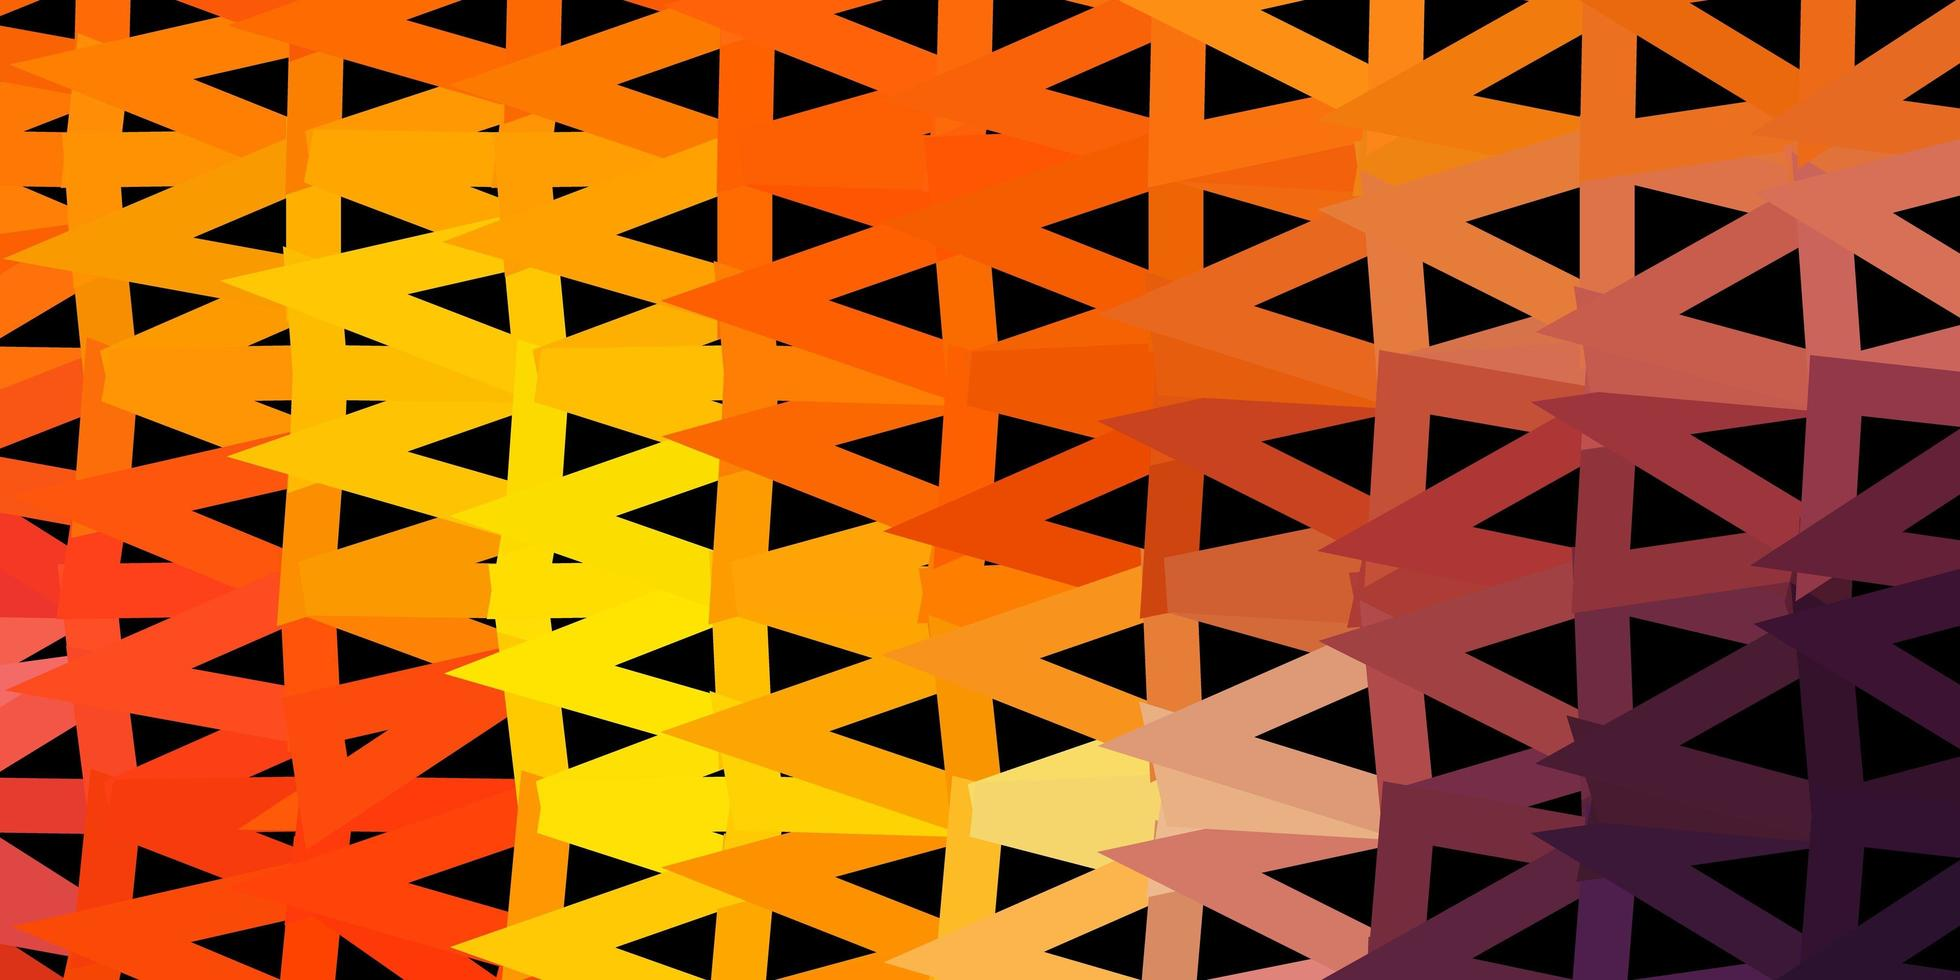 fundo poligonal do vetor rosa claro, amarelo.